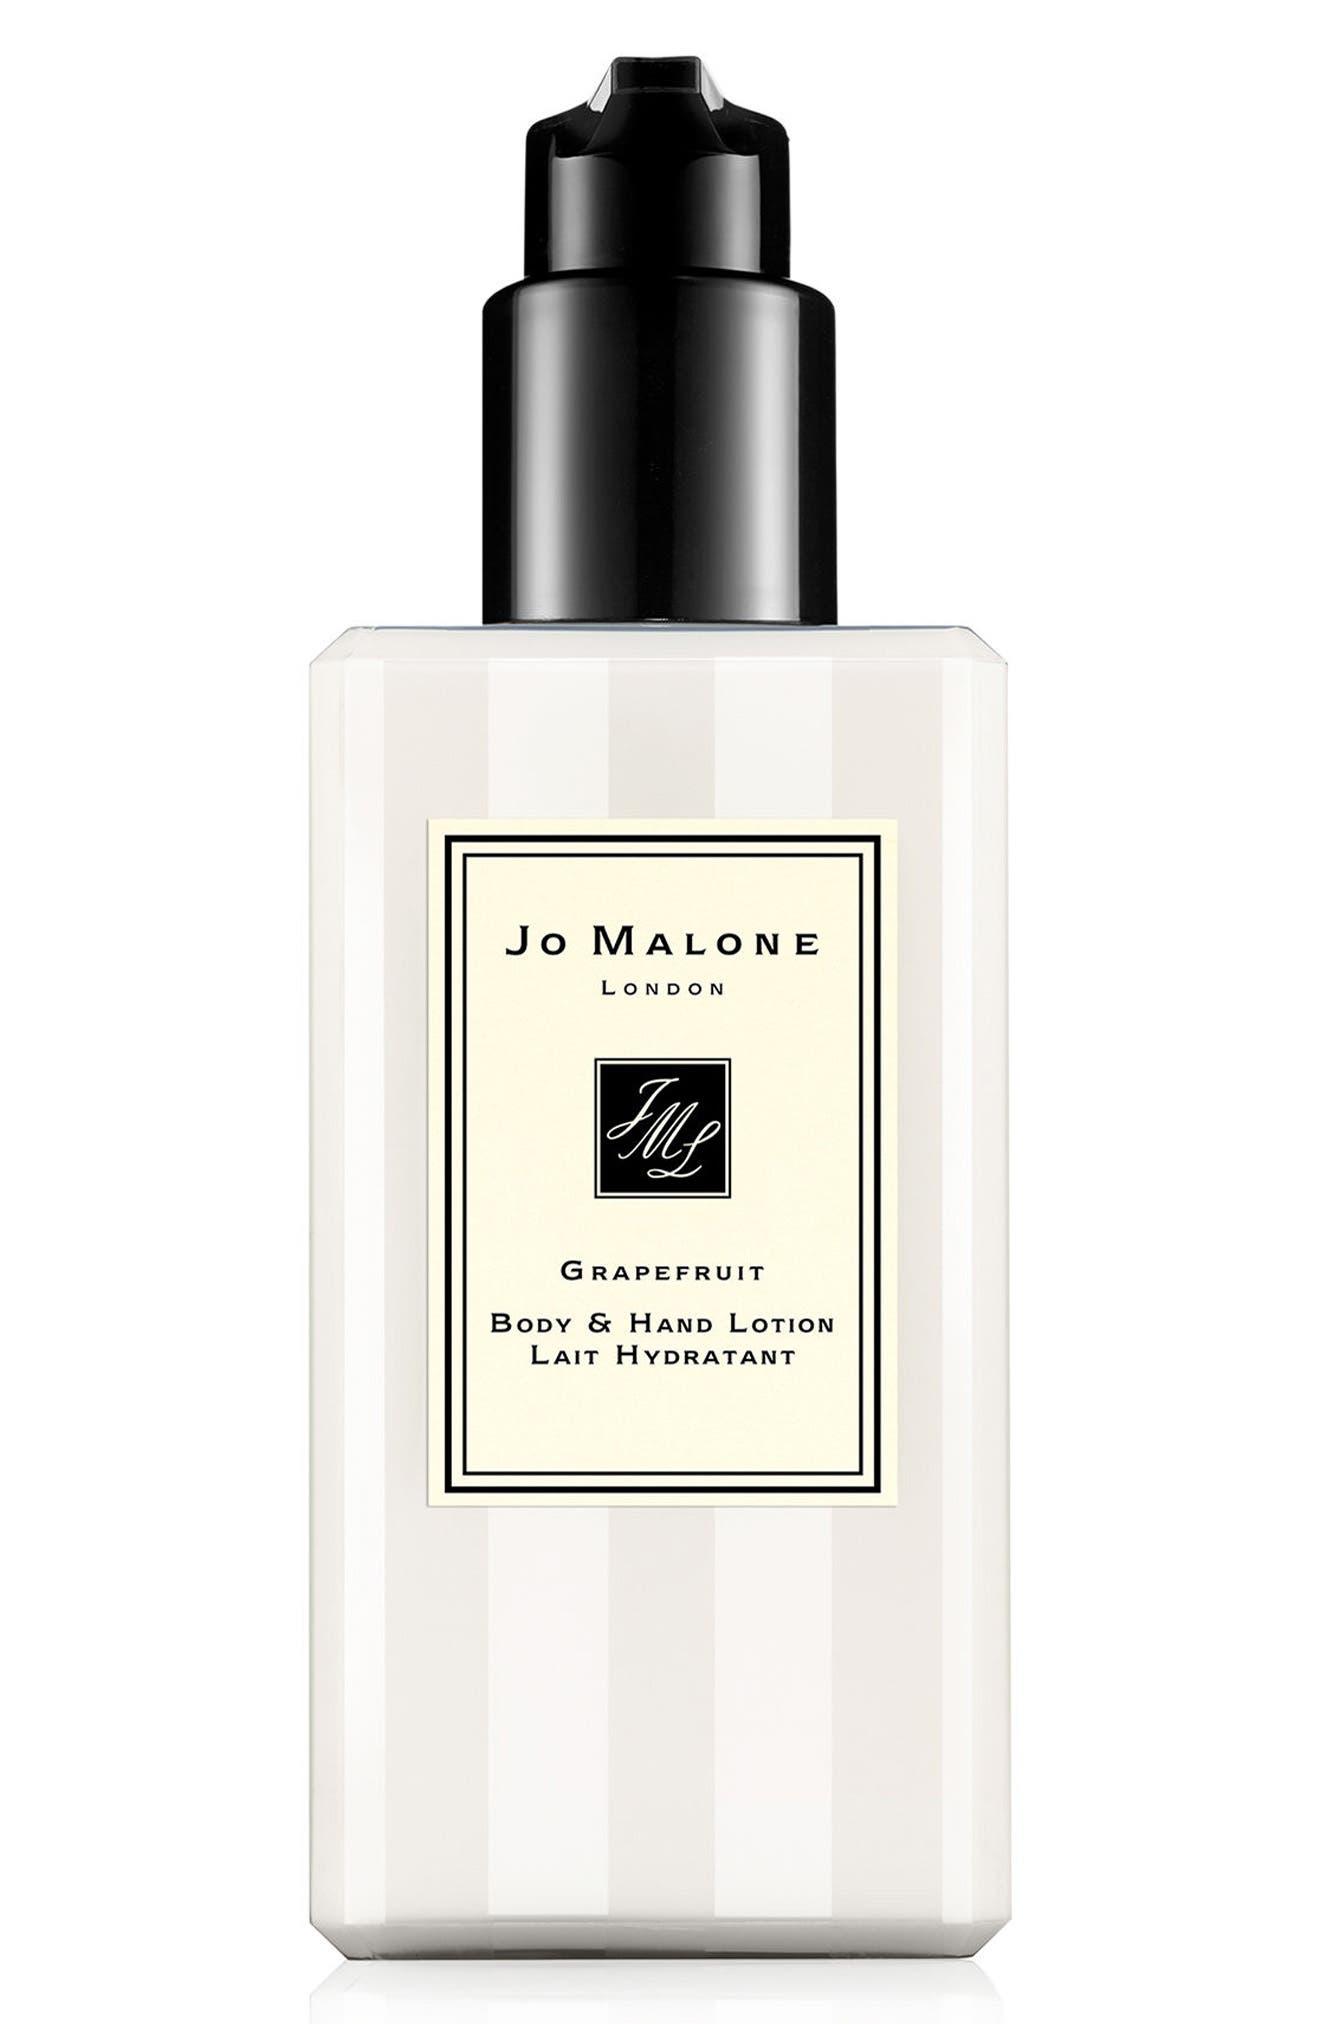 Jo Malone London(TM) Grapefruit Body Lotion